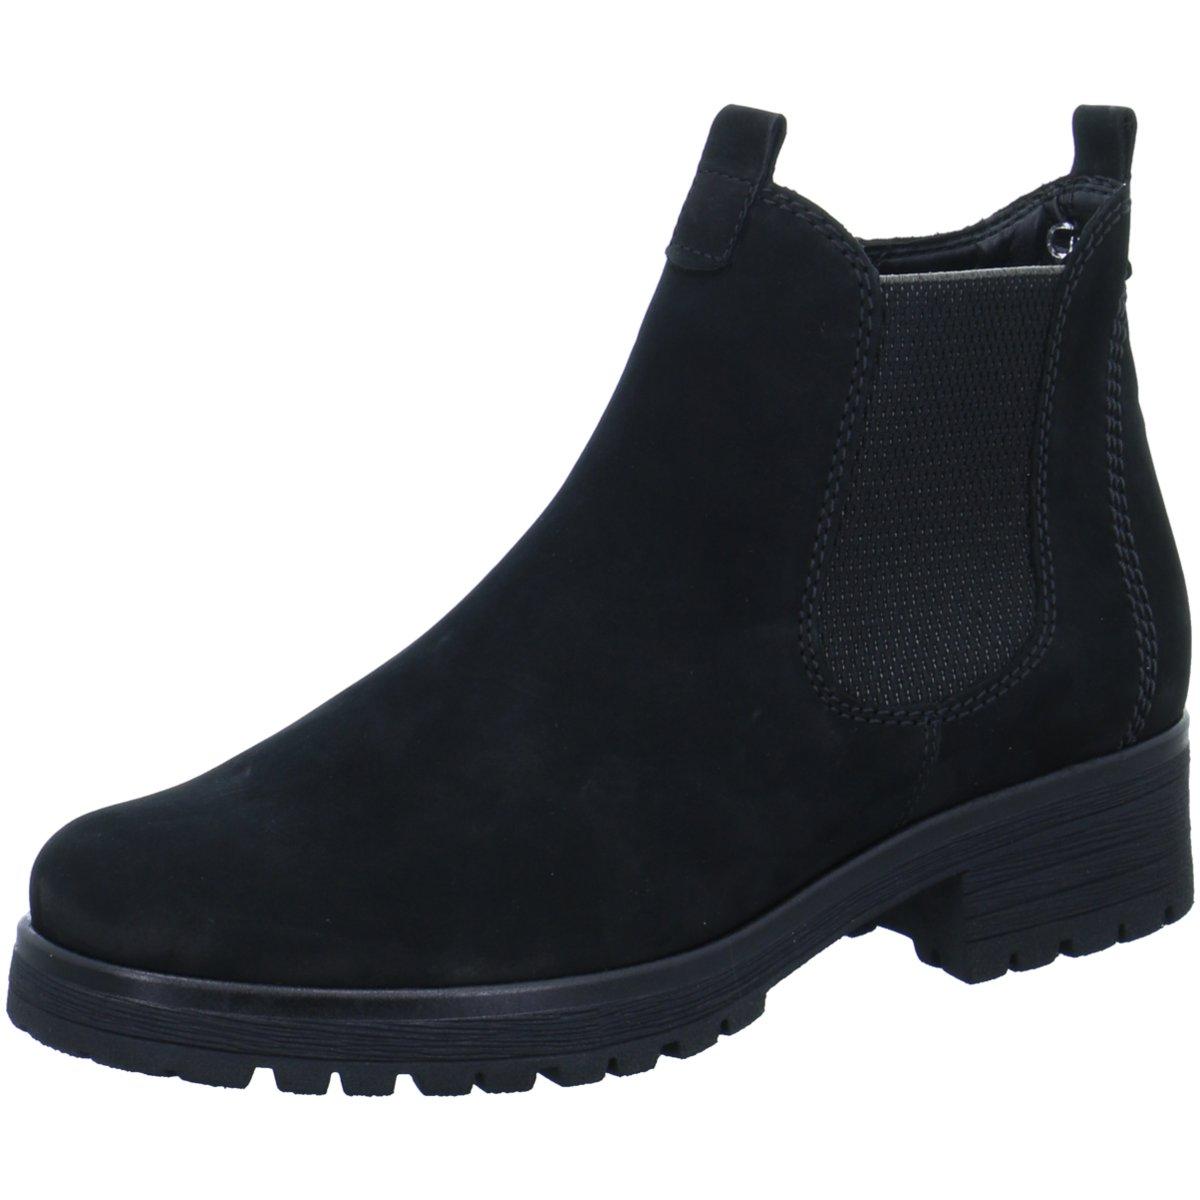 SneakerSportschuheHalbschuhe, Mjus,Leder, schwarz, neu, Gr.39